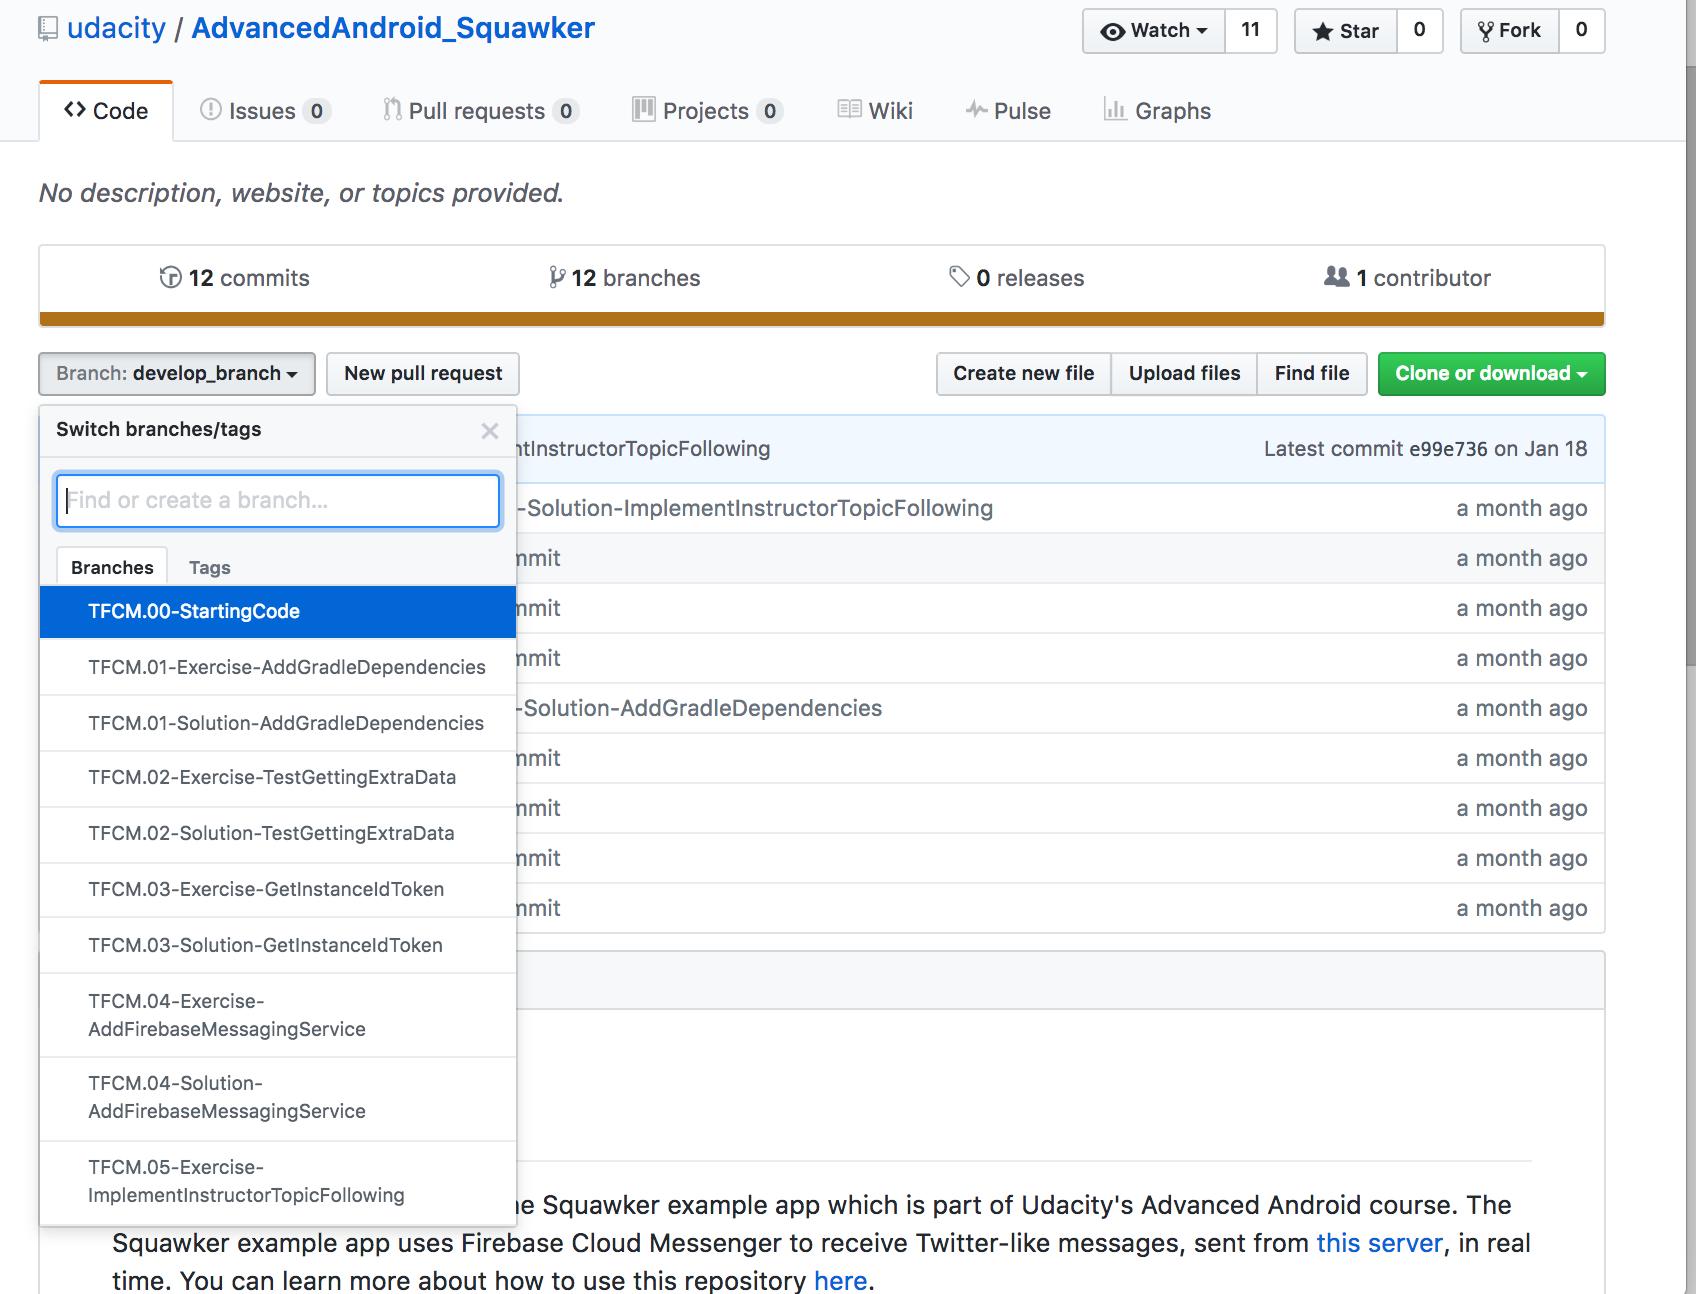 GitHub - udacity/AdvancedAndroid_Emojify